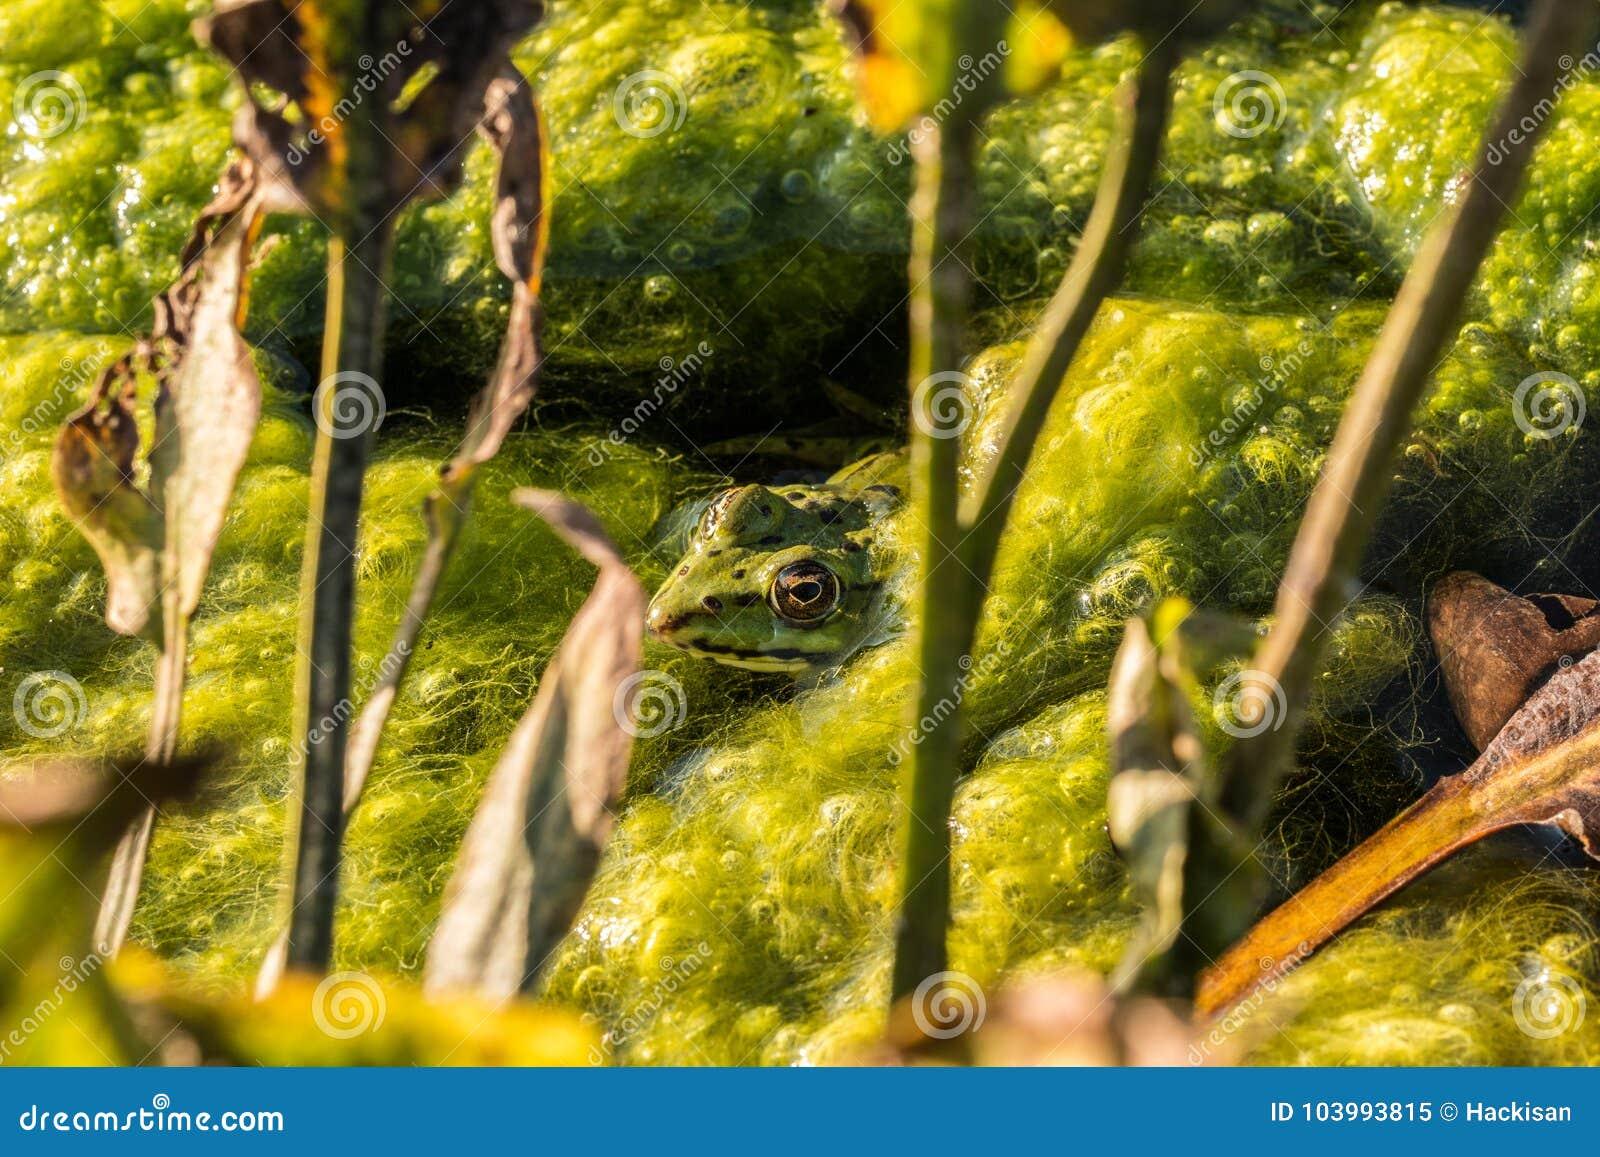 Hidden frog in the lake